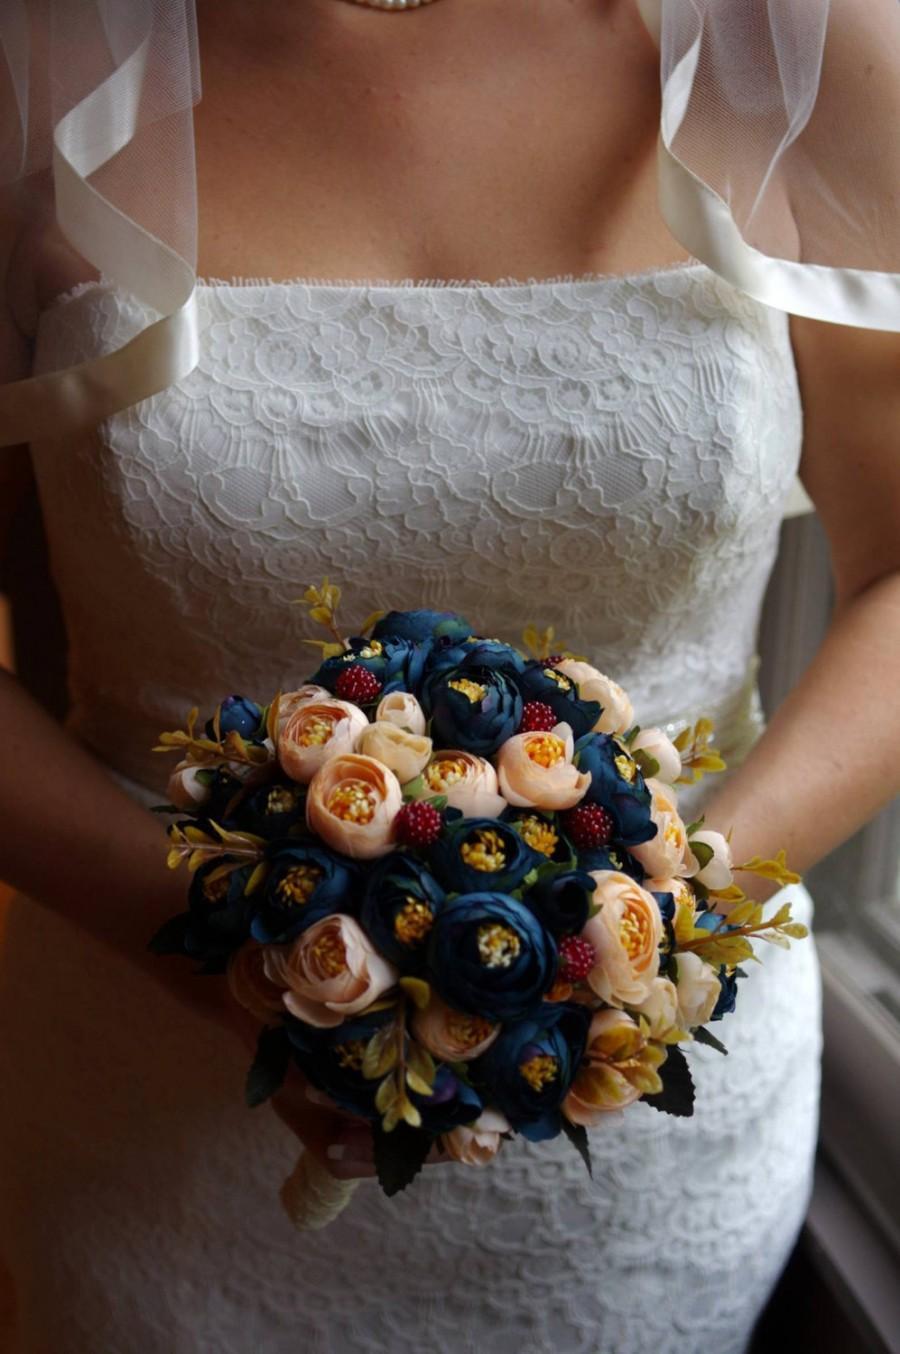 Mariage - Bridal Bouquet, Blue and Champagne Ranunculus, Silk Wedding Flowers, Vintage Wedding, Rustic Wedding, Shabby Chic Wedding, Bride, Bridesmade